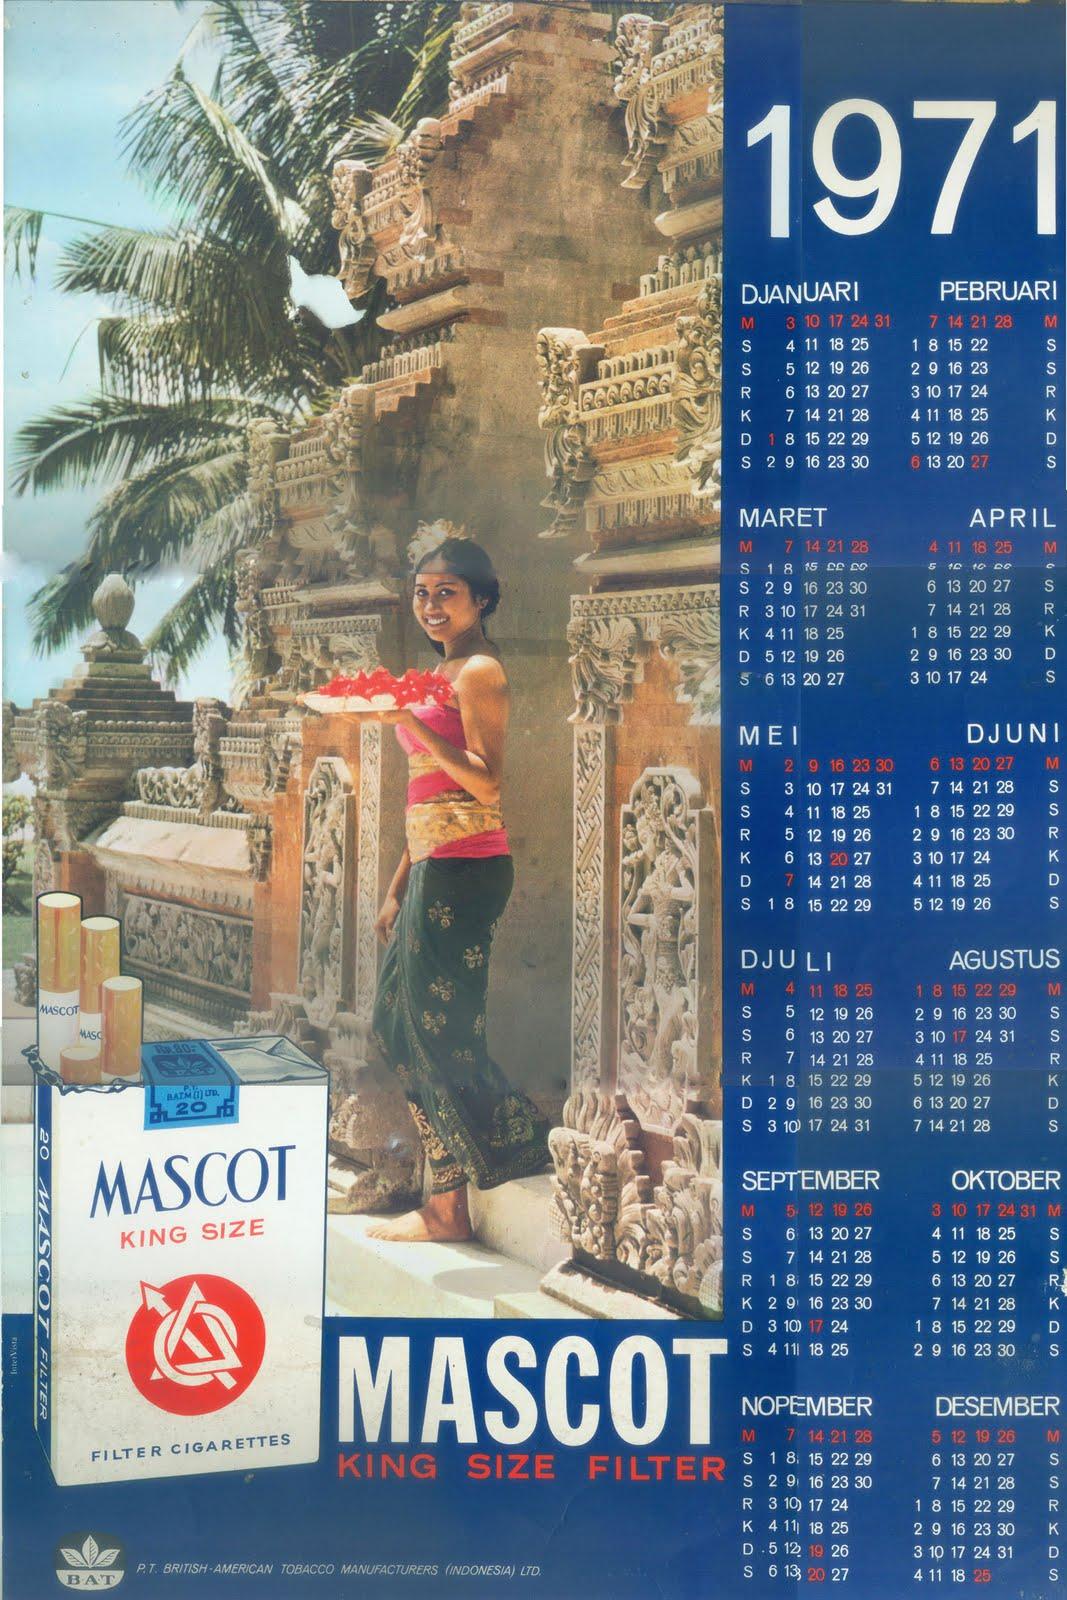 http://2.bp.blogspot.com/_Ru-fLfhM13o/TRIwxsNrddI/AAAAAAAACeI/NK4240S8_lc/s1600/kalender.JPG